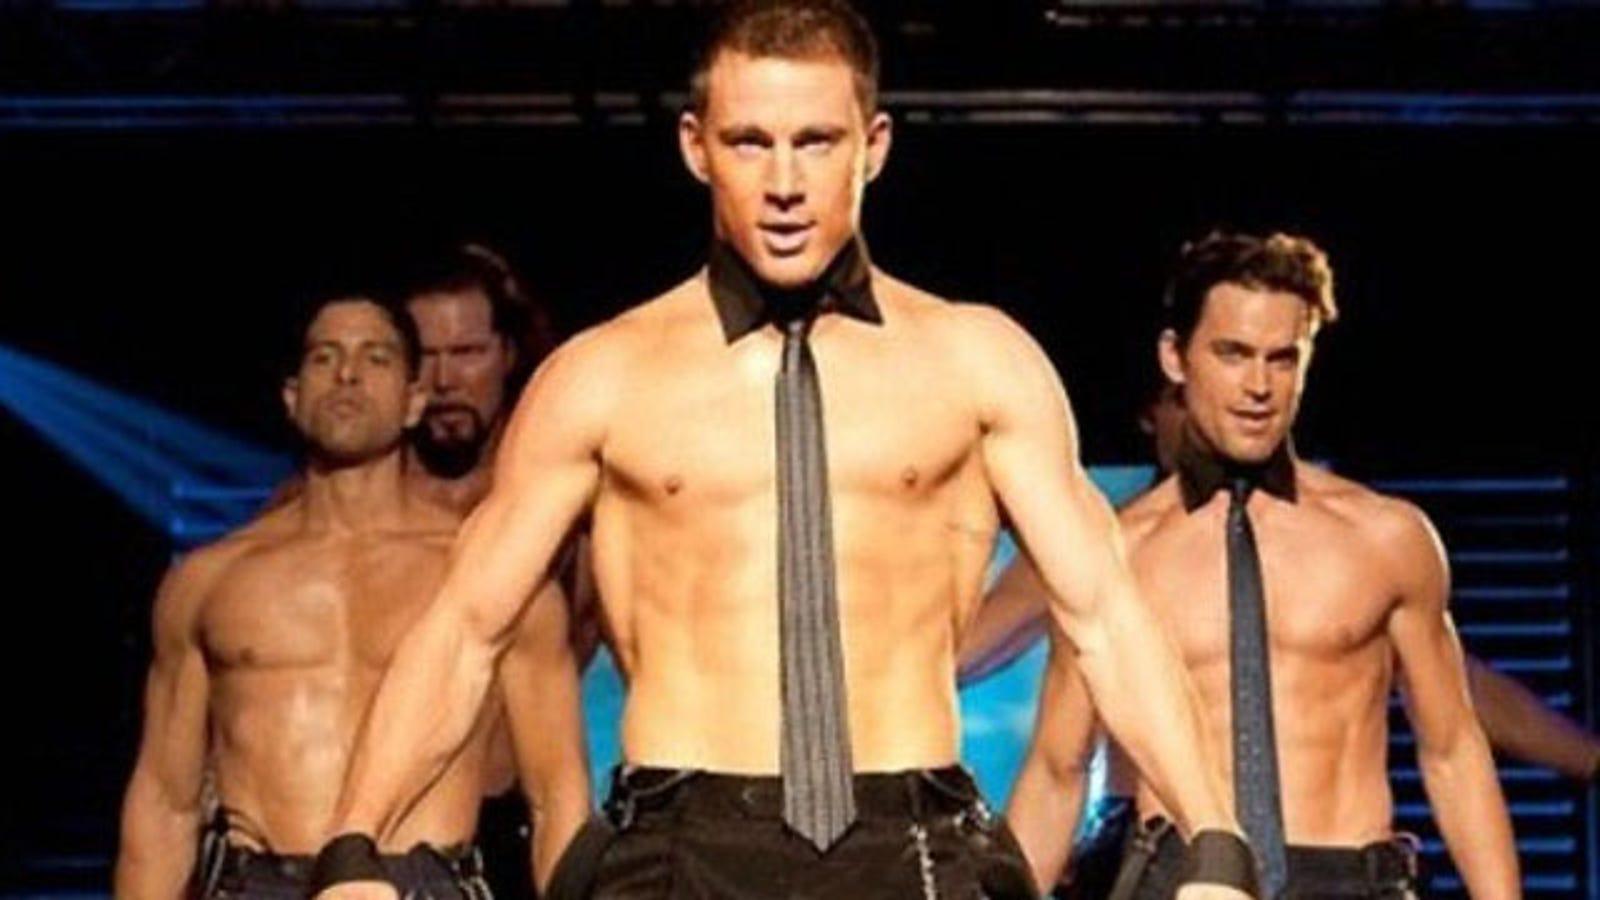 Glorias male strip club